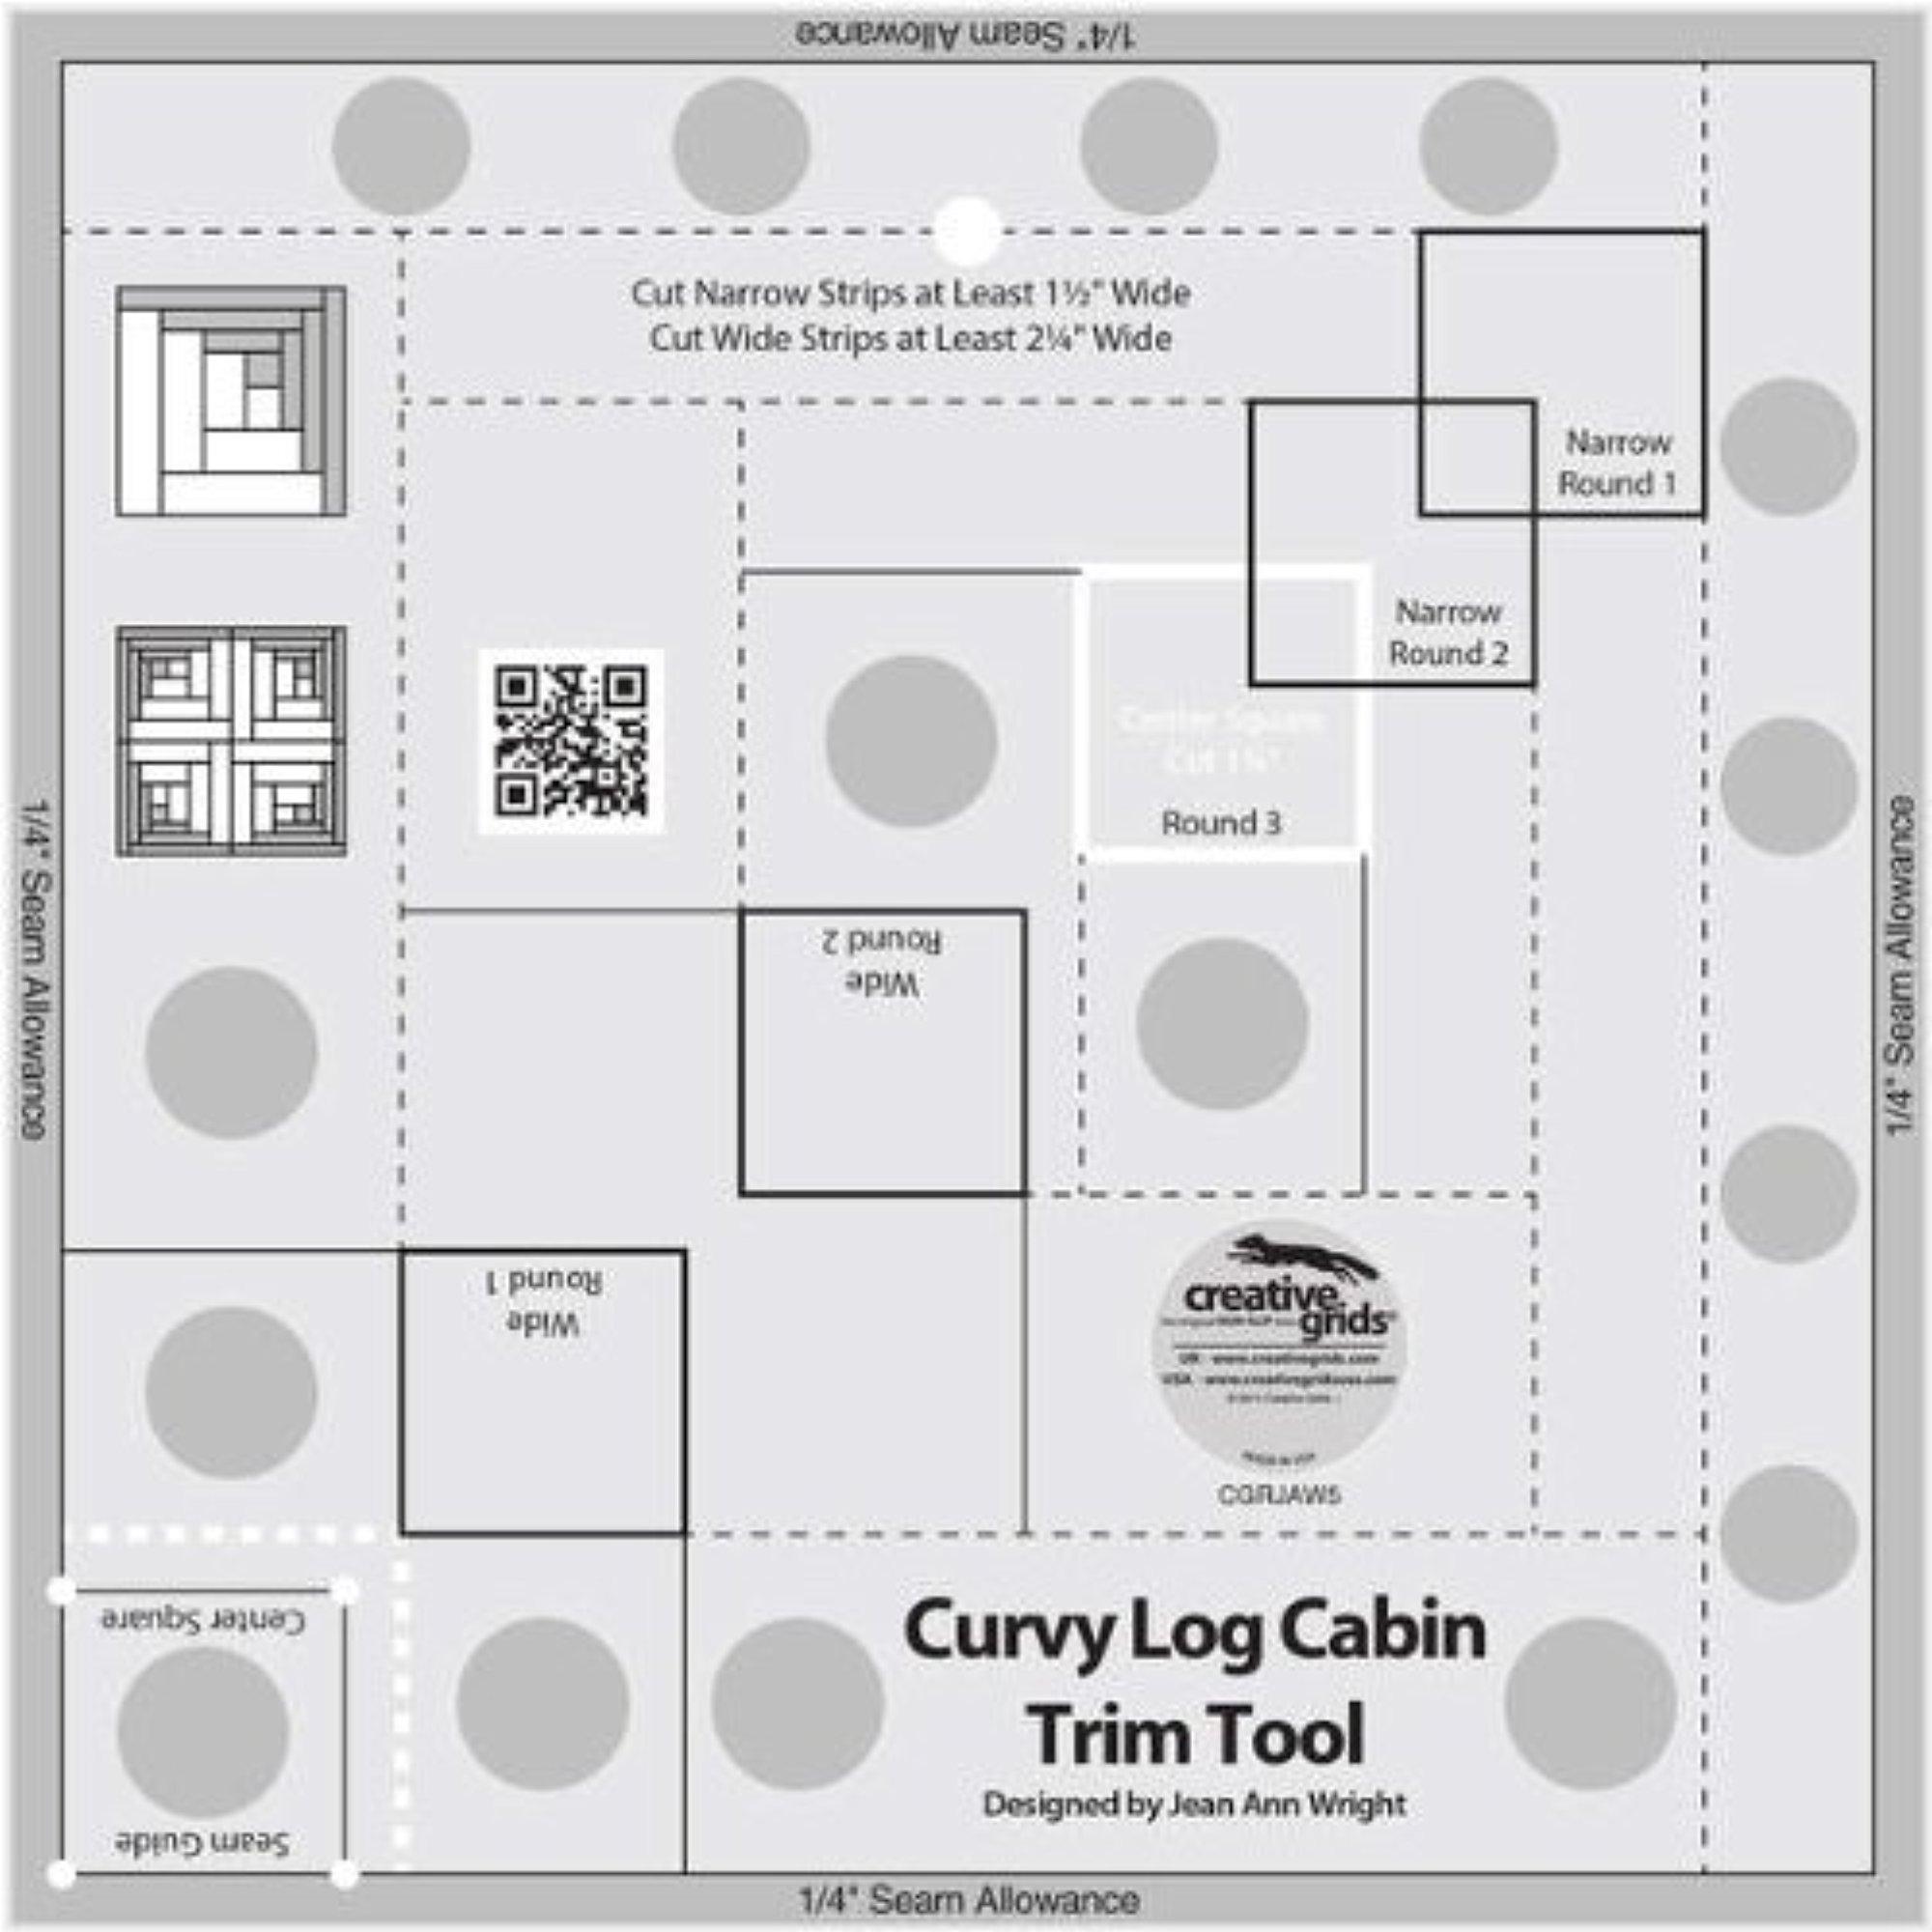 Creative Grids Curvy Log Cabin Trim Tool for 8 Finished Blocks Ruler